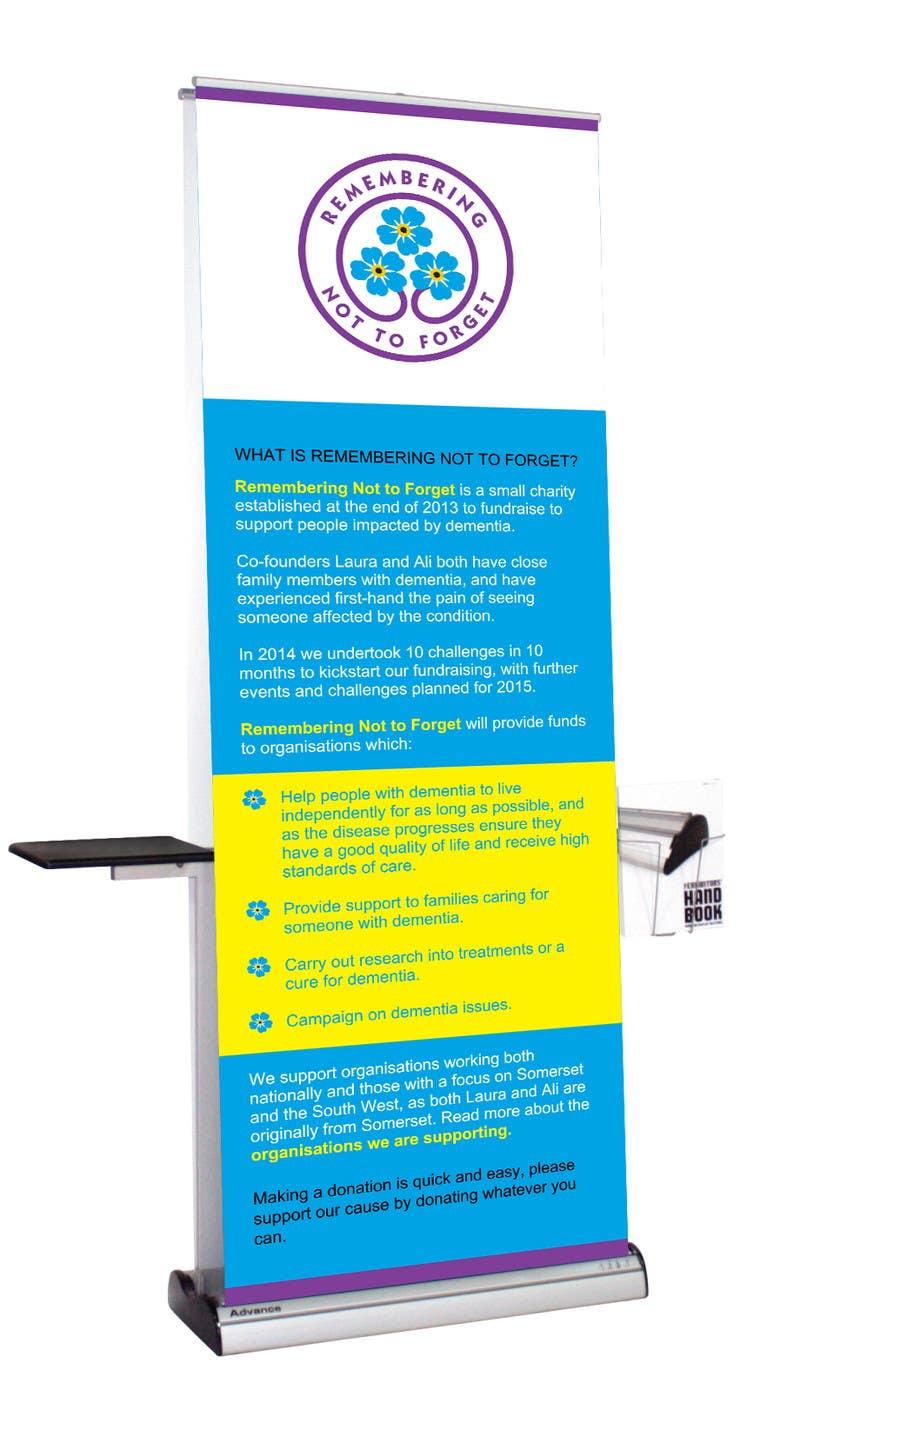 Bài tham dự cuộc thi #13 cho Design a standing banner for a small charity